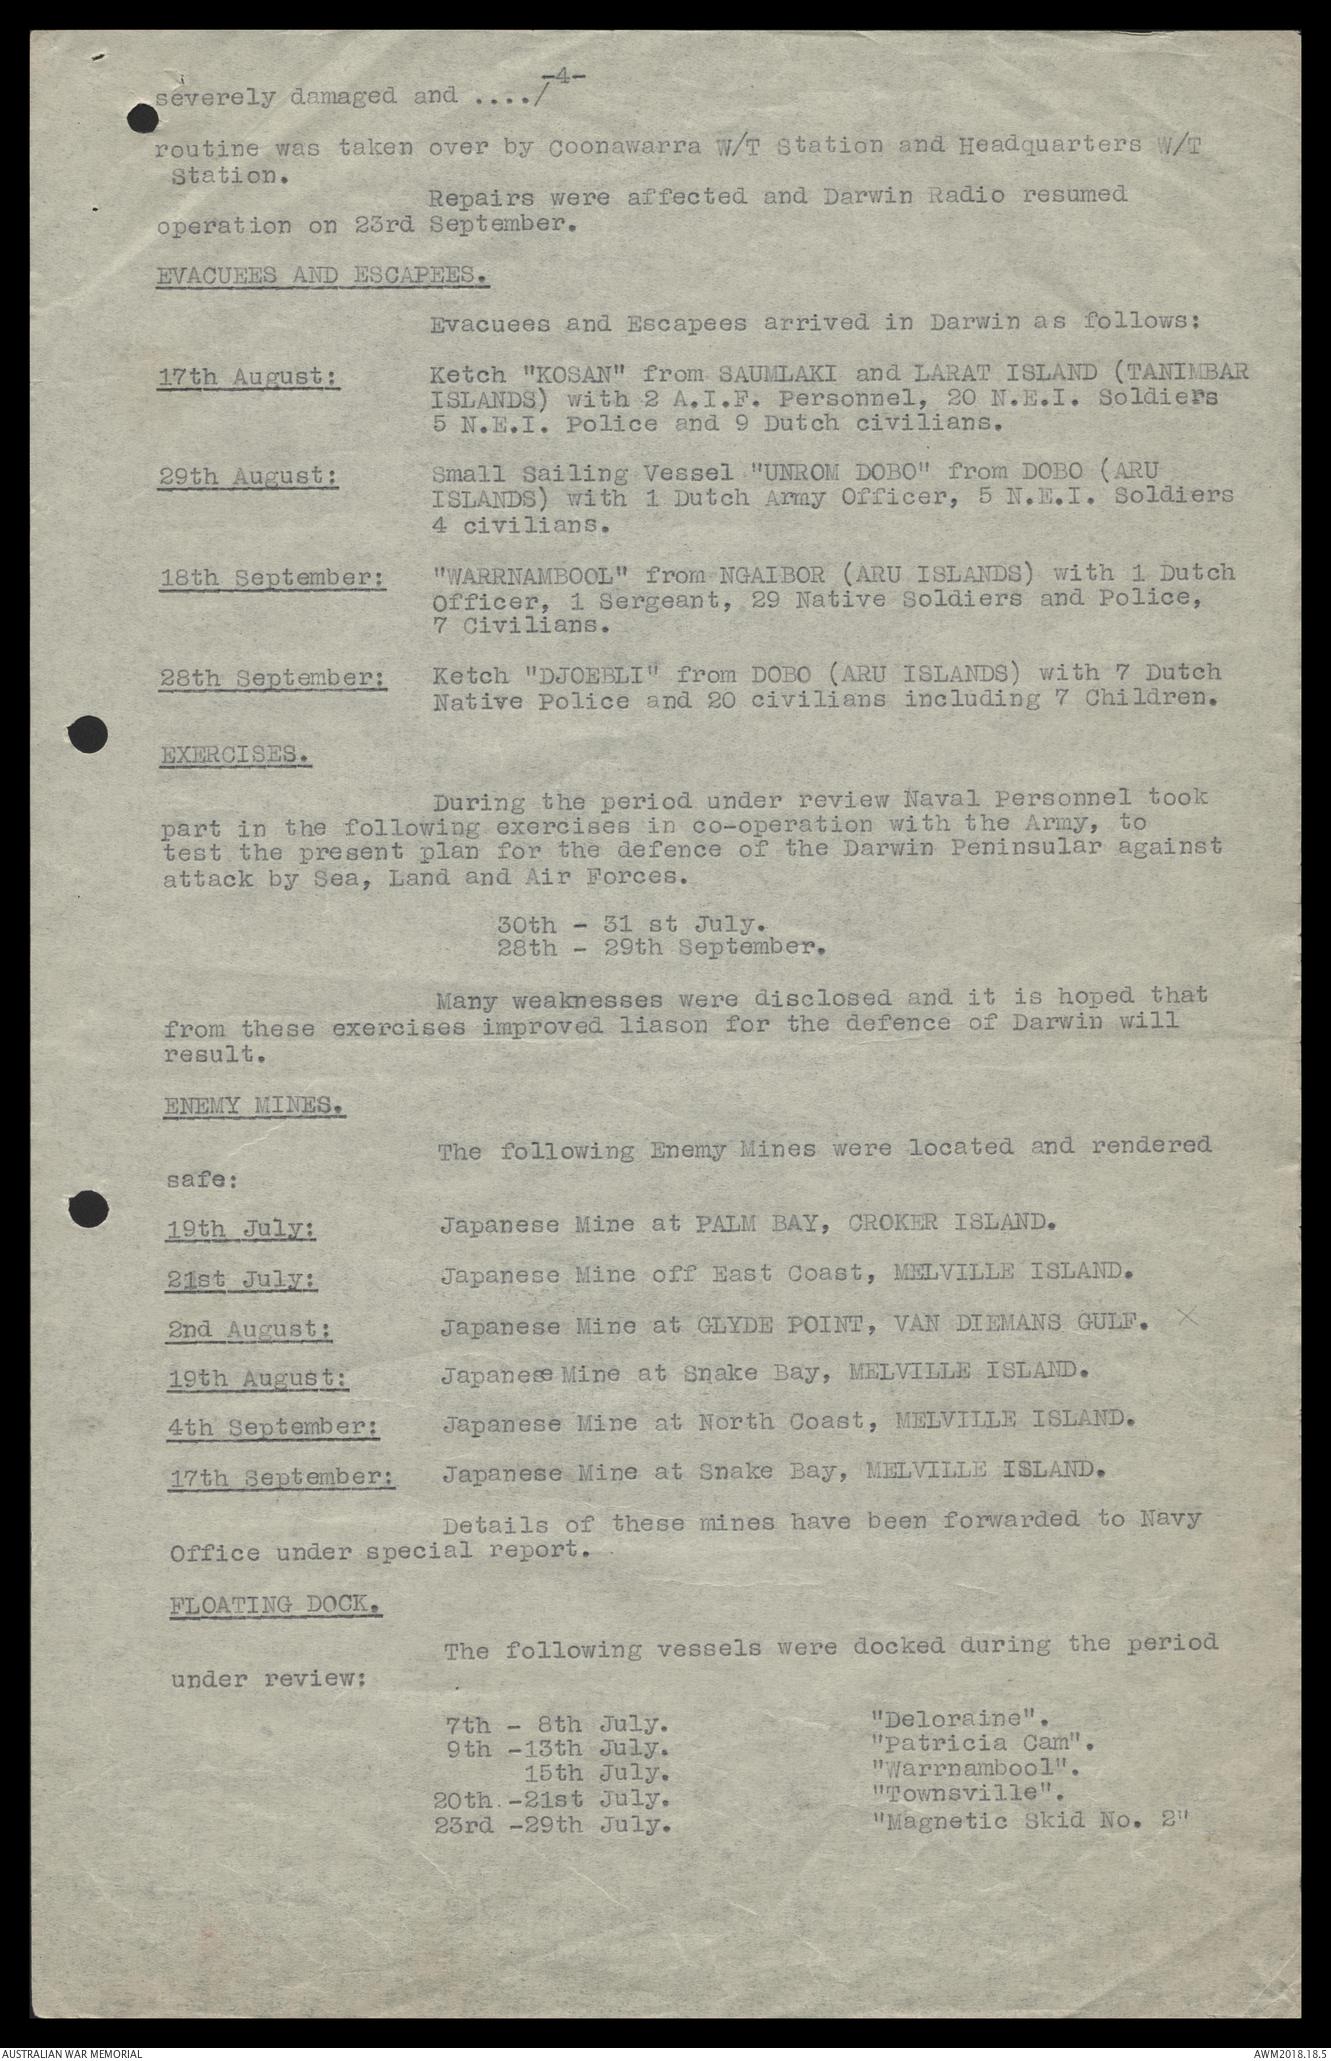 AWM78 400 2 PART 4 January 1941 September 1945